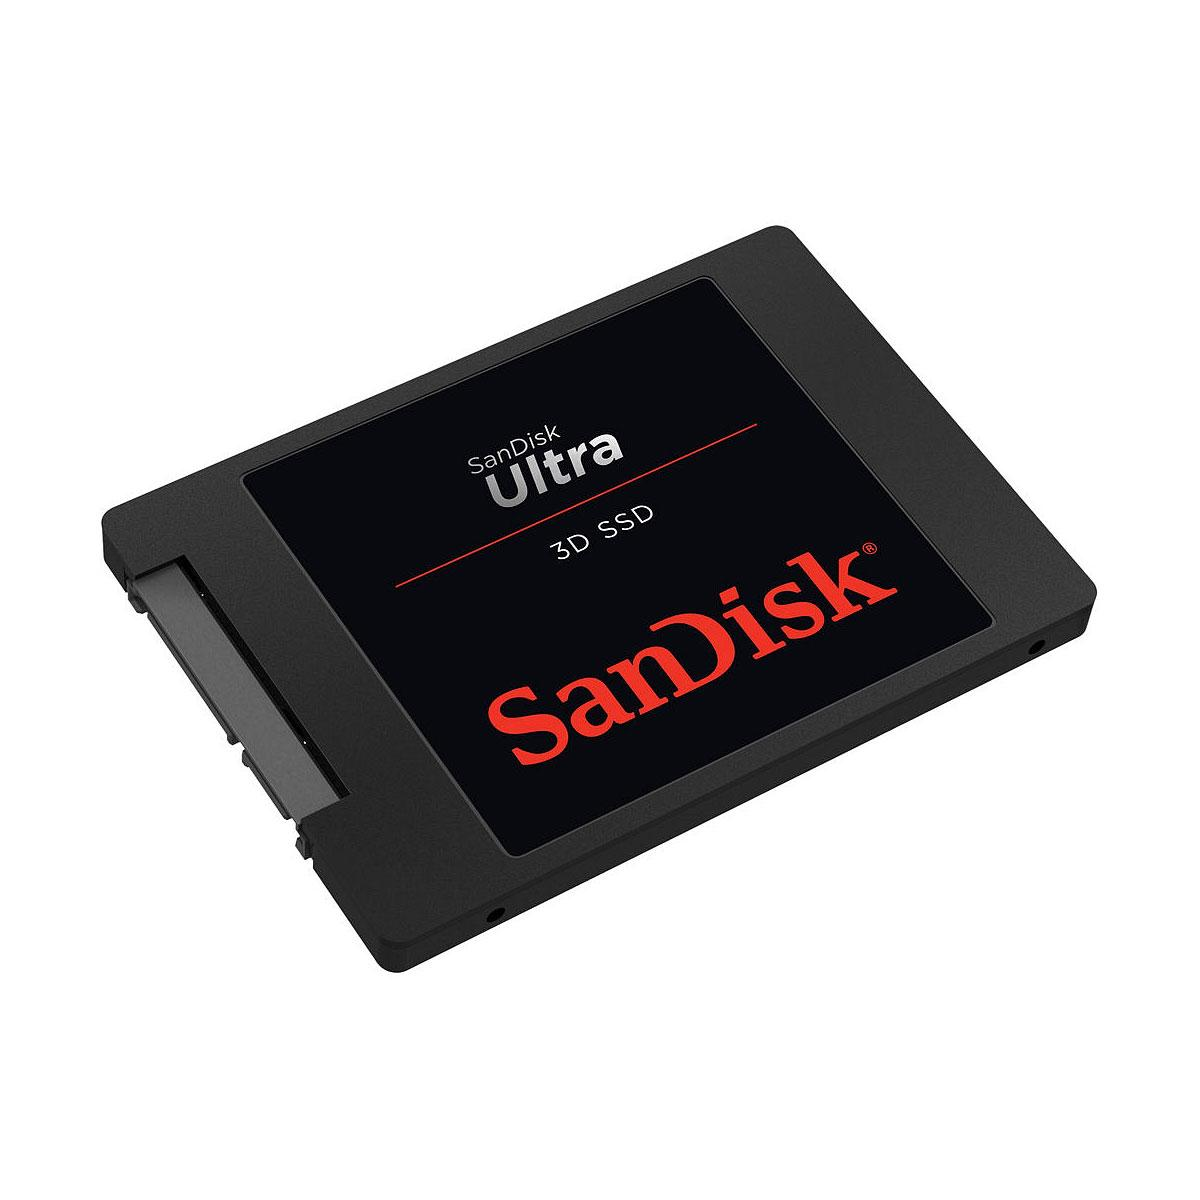 SanDisk SSD Ultra 3D 2TB 560MB/s Read 530MB/s Write